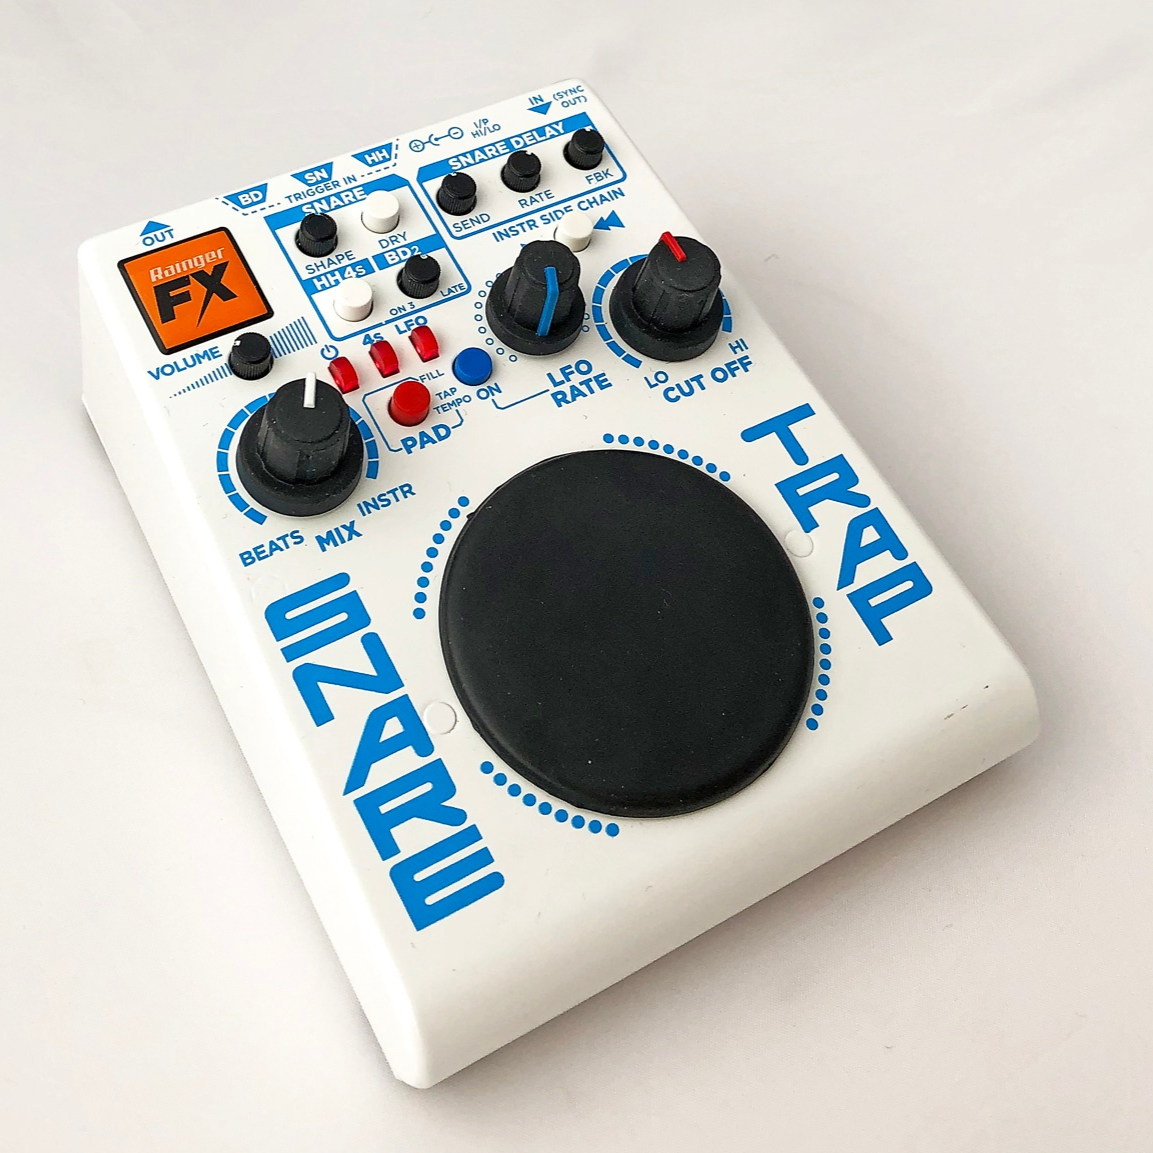 RaingerFX // David Rainger // Snare Trap